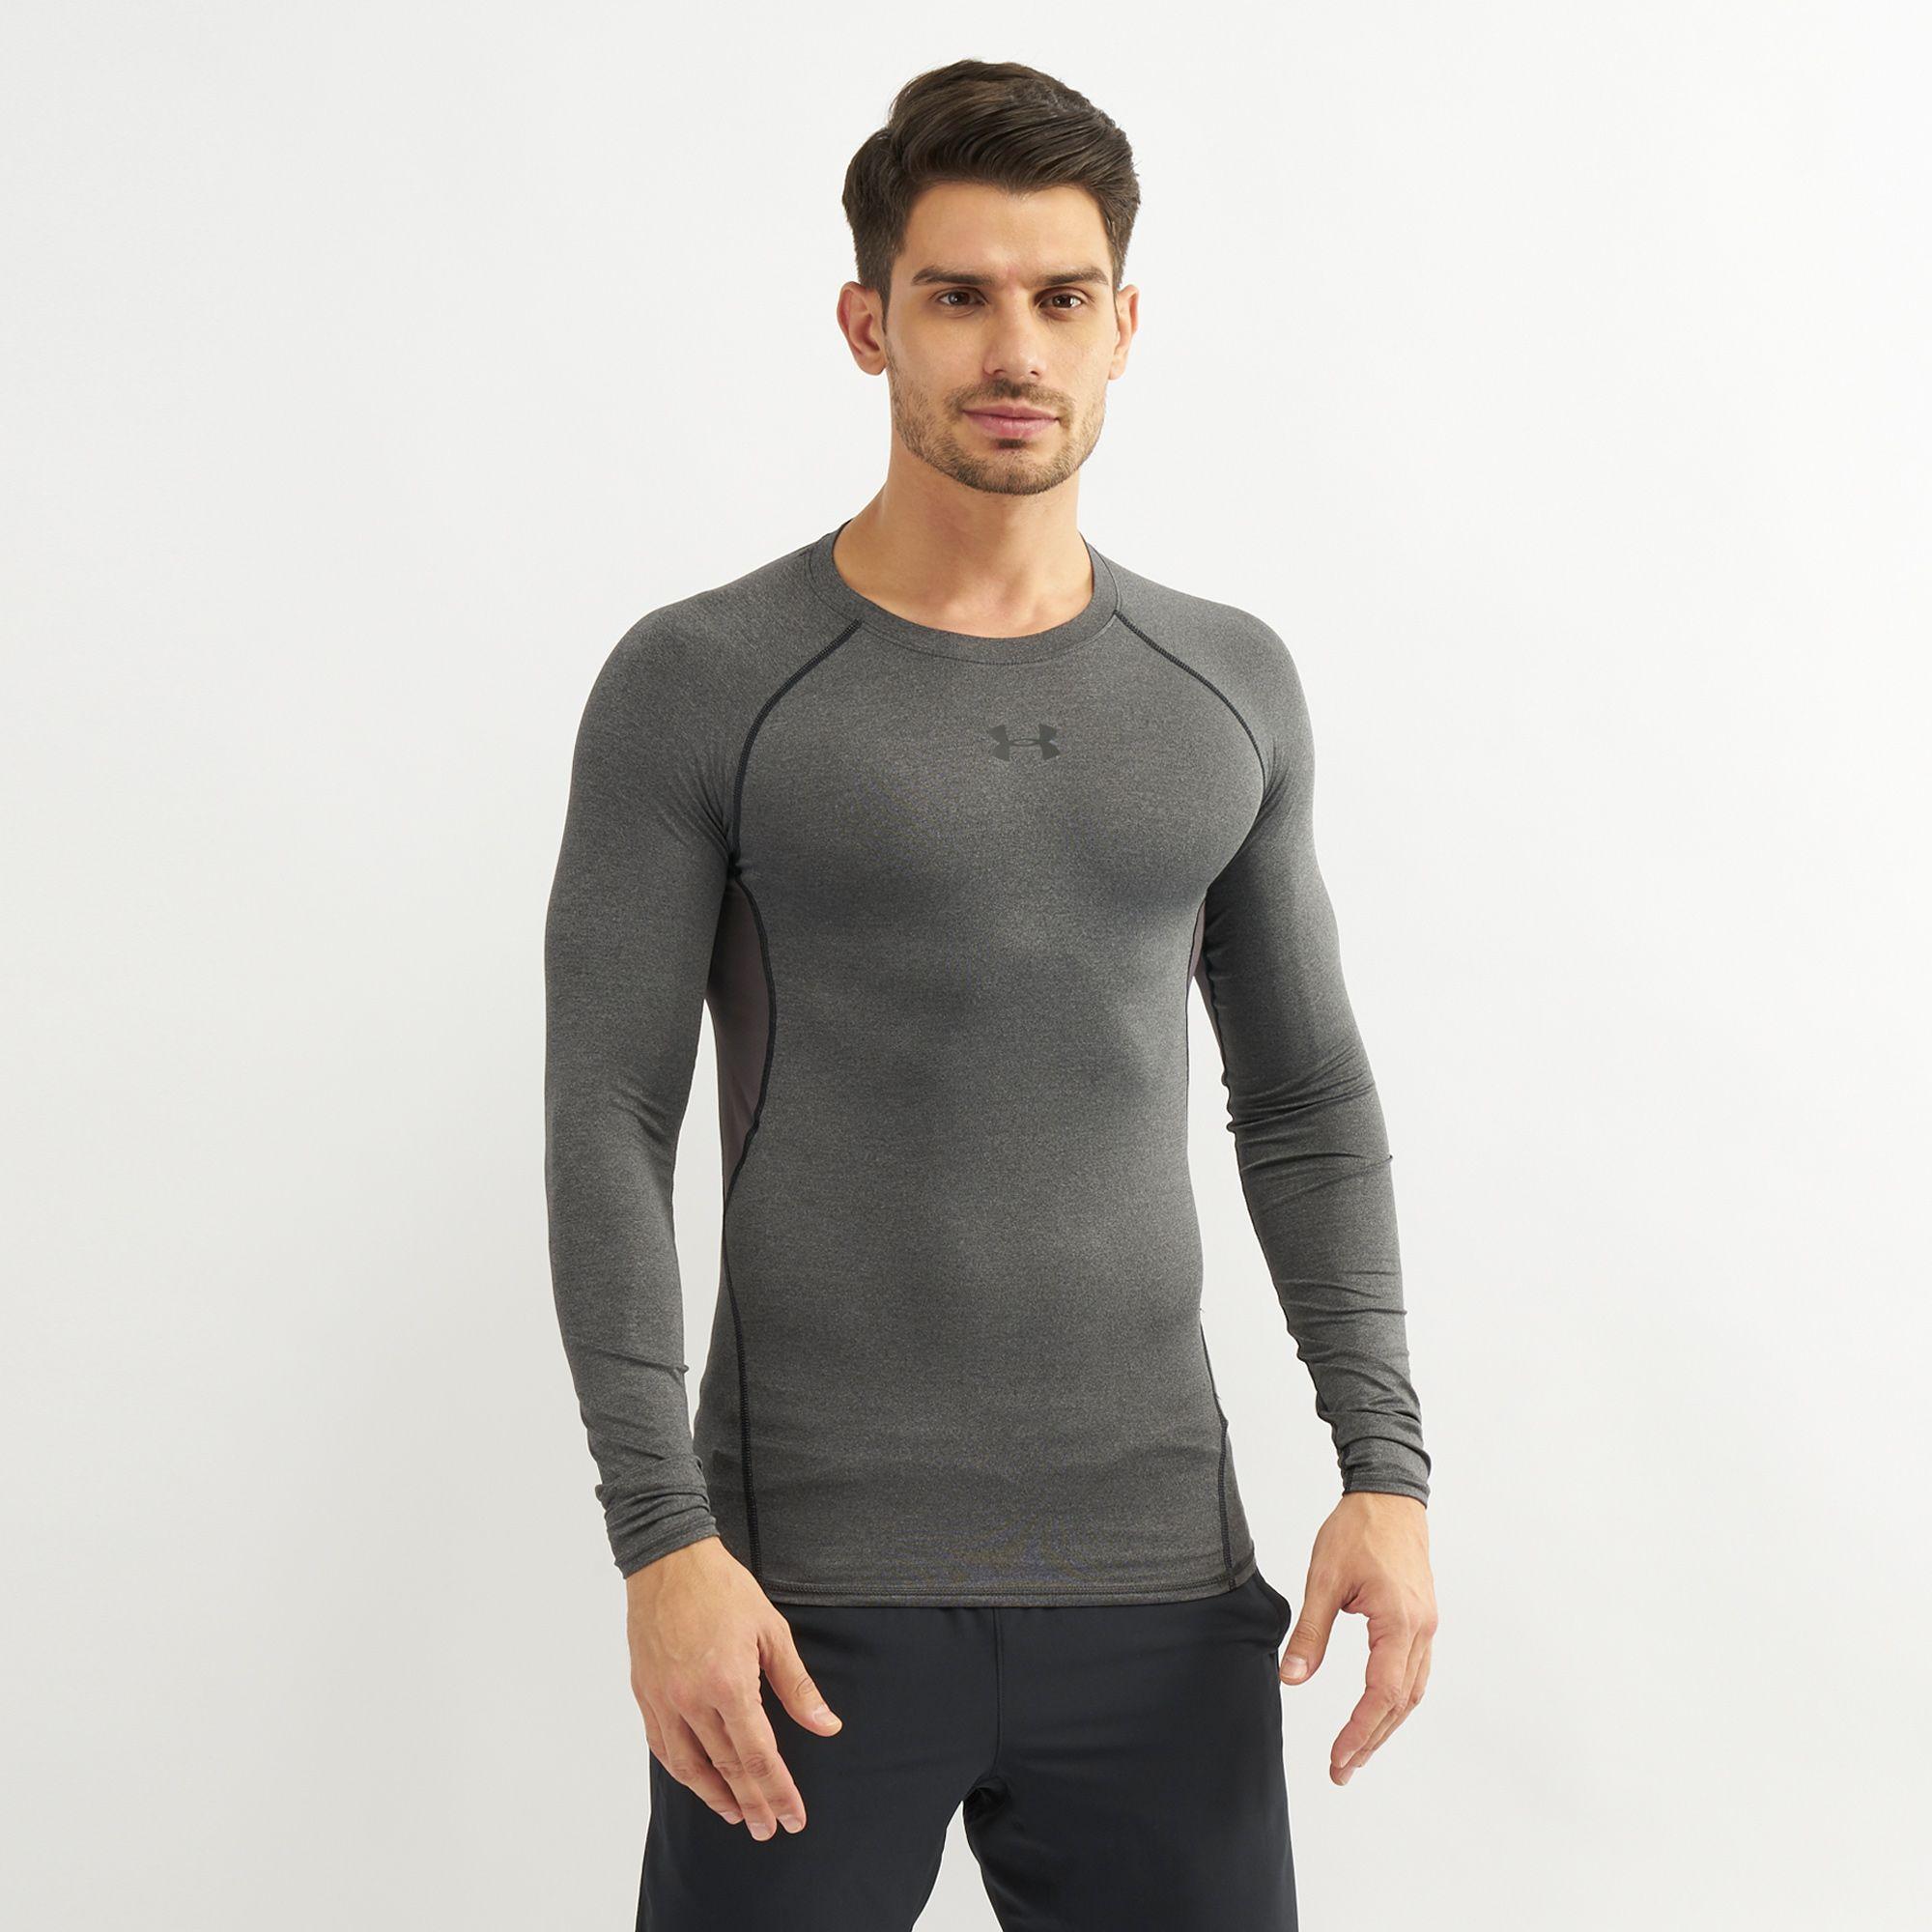 Under Armour Men's HeatGear® Armour Long Sleeve Compression T-Shirt